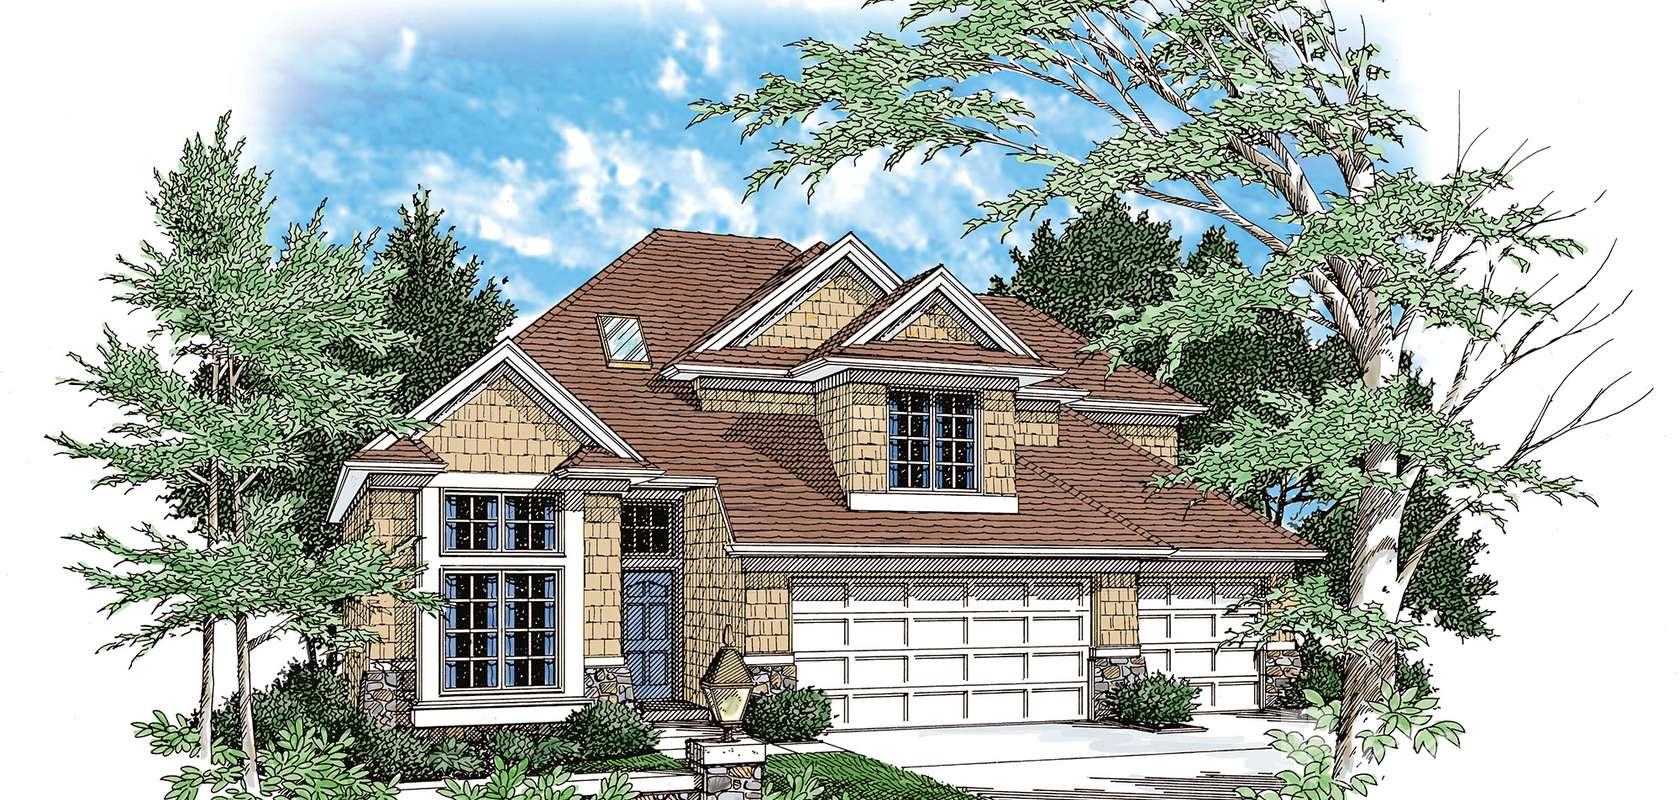 Mascord House Plan B2149C-Truss Roof: The Coburn